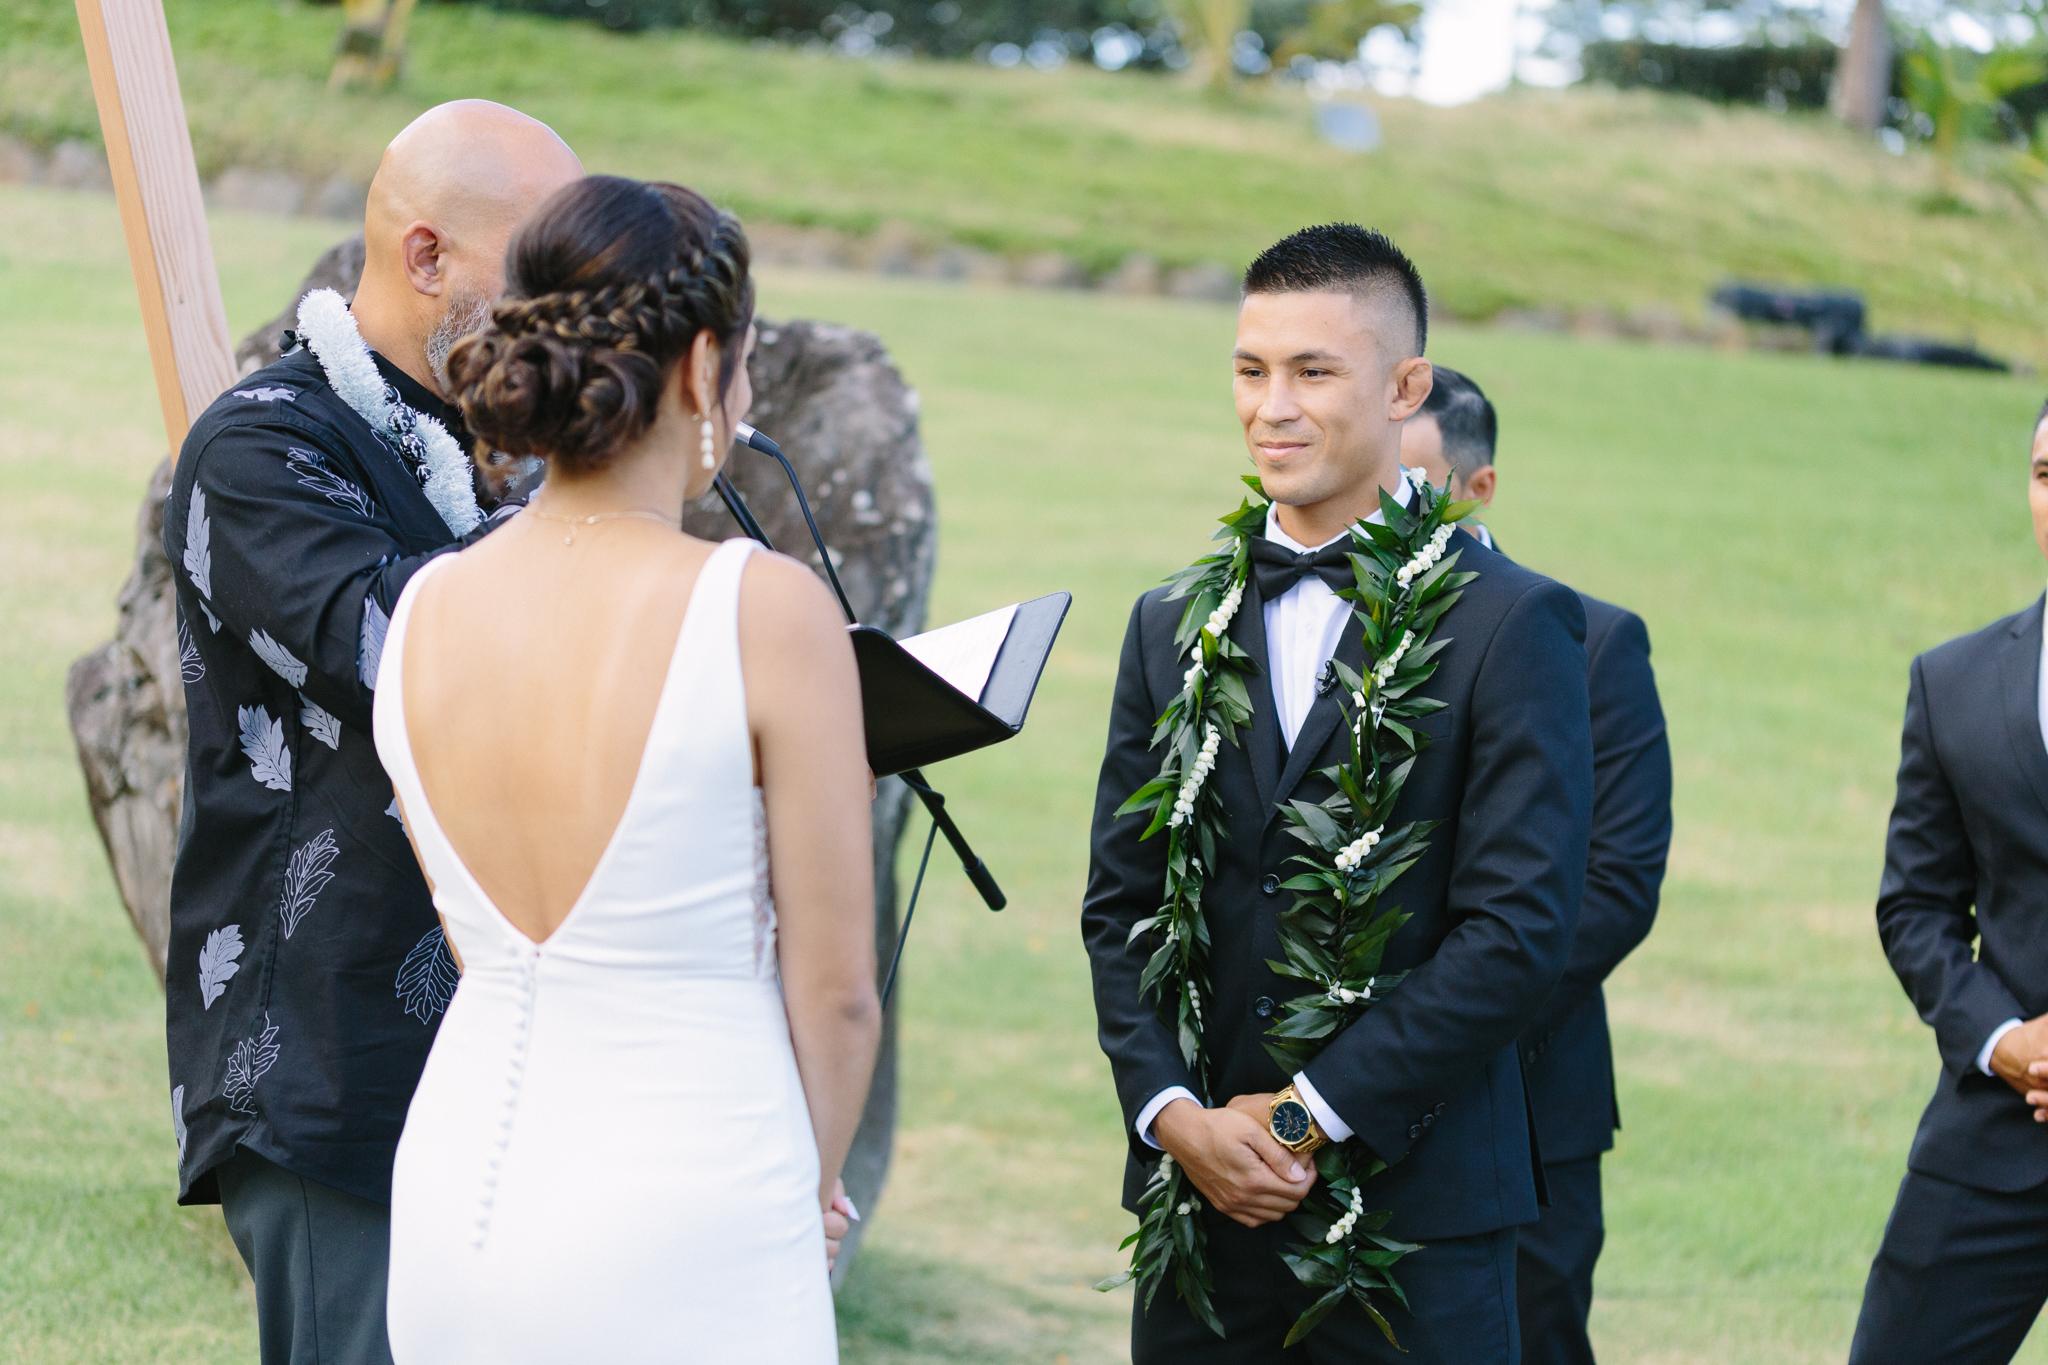 Kualoa_Ranch_Wedding_Photographer_Tone_Hawaii-18.jpg